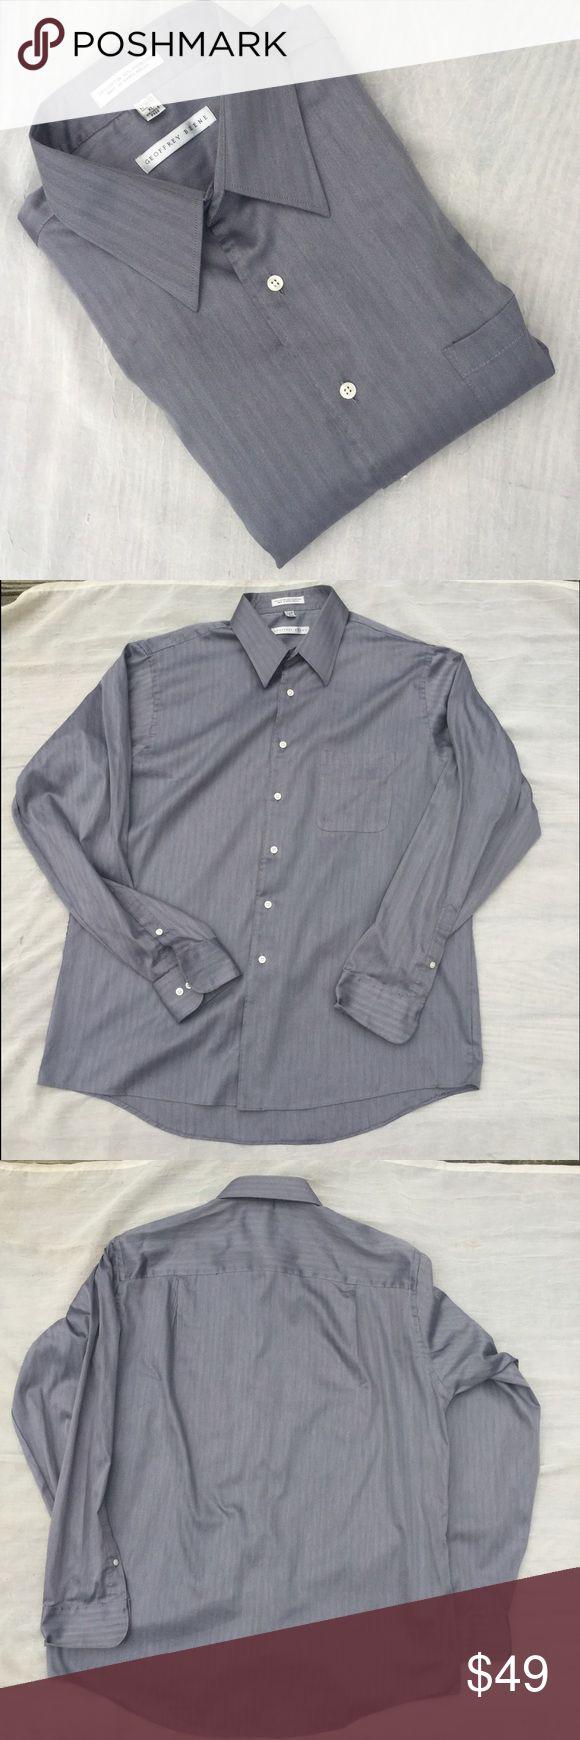 "Geoffrey Beene Shirt Wrinkle free • Size XL 17"" 36/37 • Excellent condition • 70% Cotton 30% Polyester Geoffrey Beene Shirts Dress Shirts"